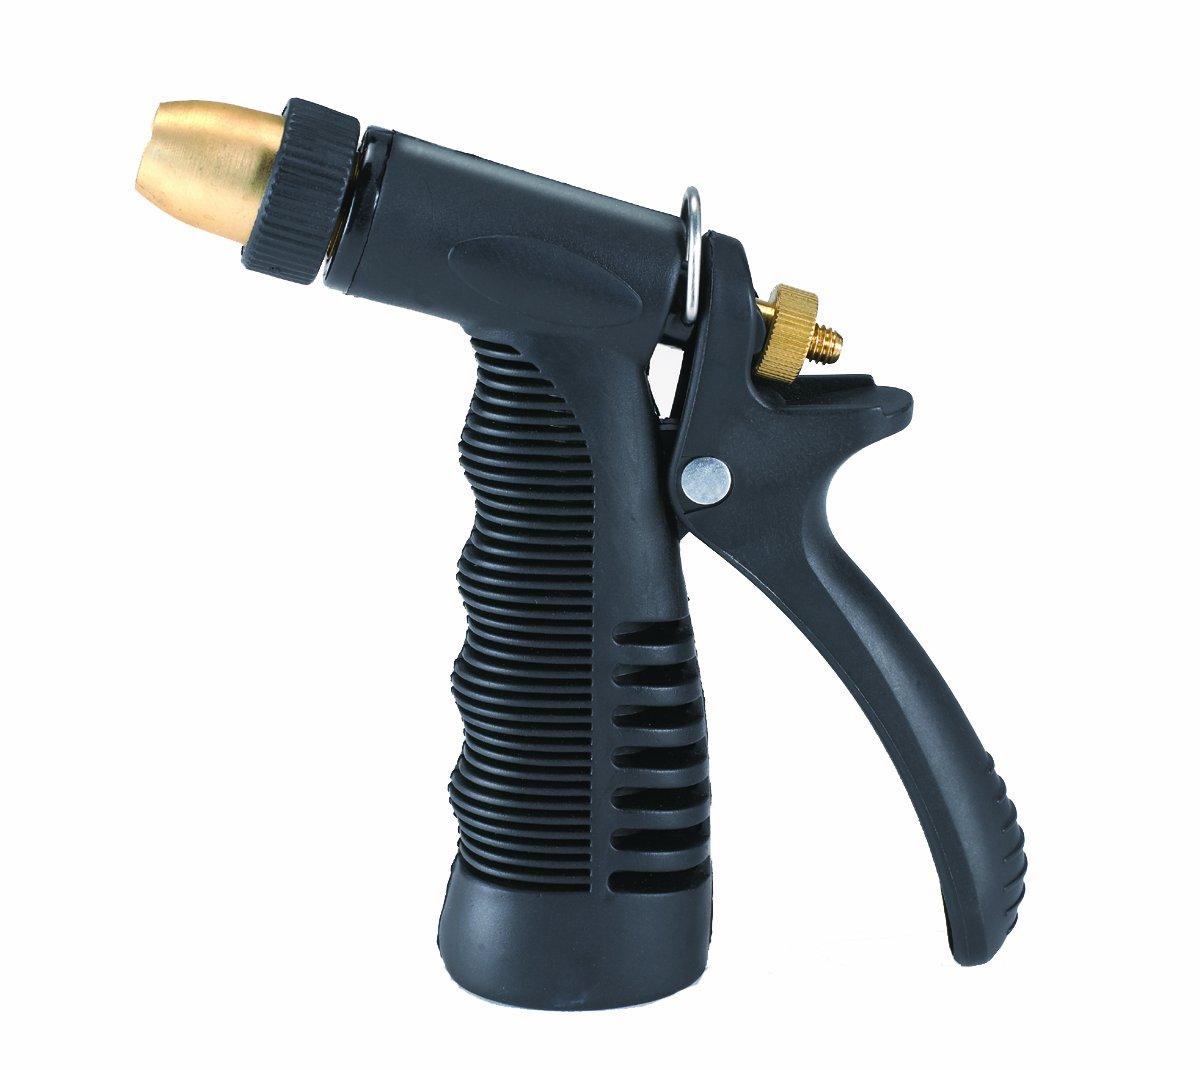 Shurhold 288 Hose Nozzle